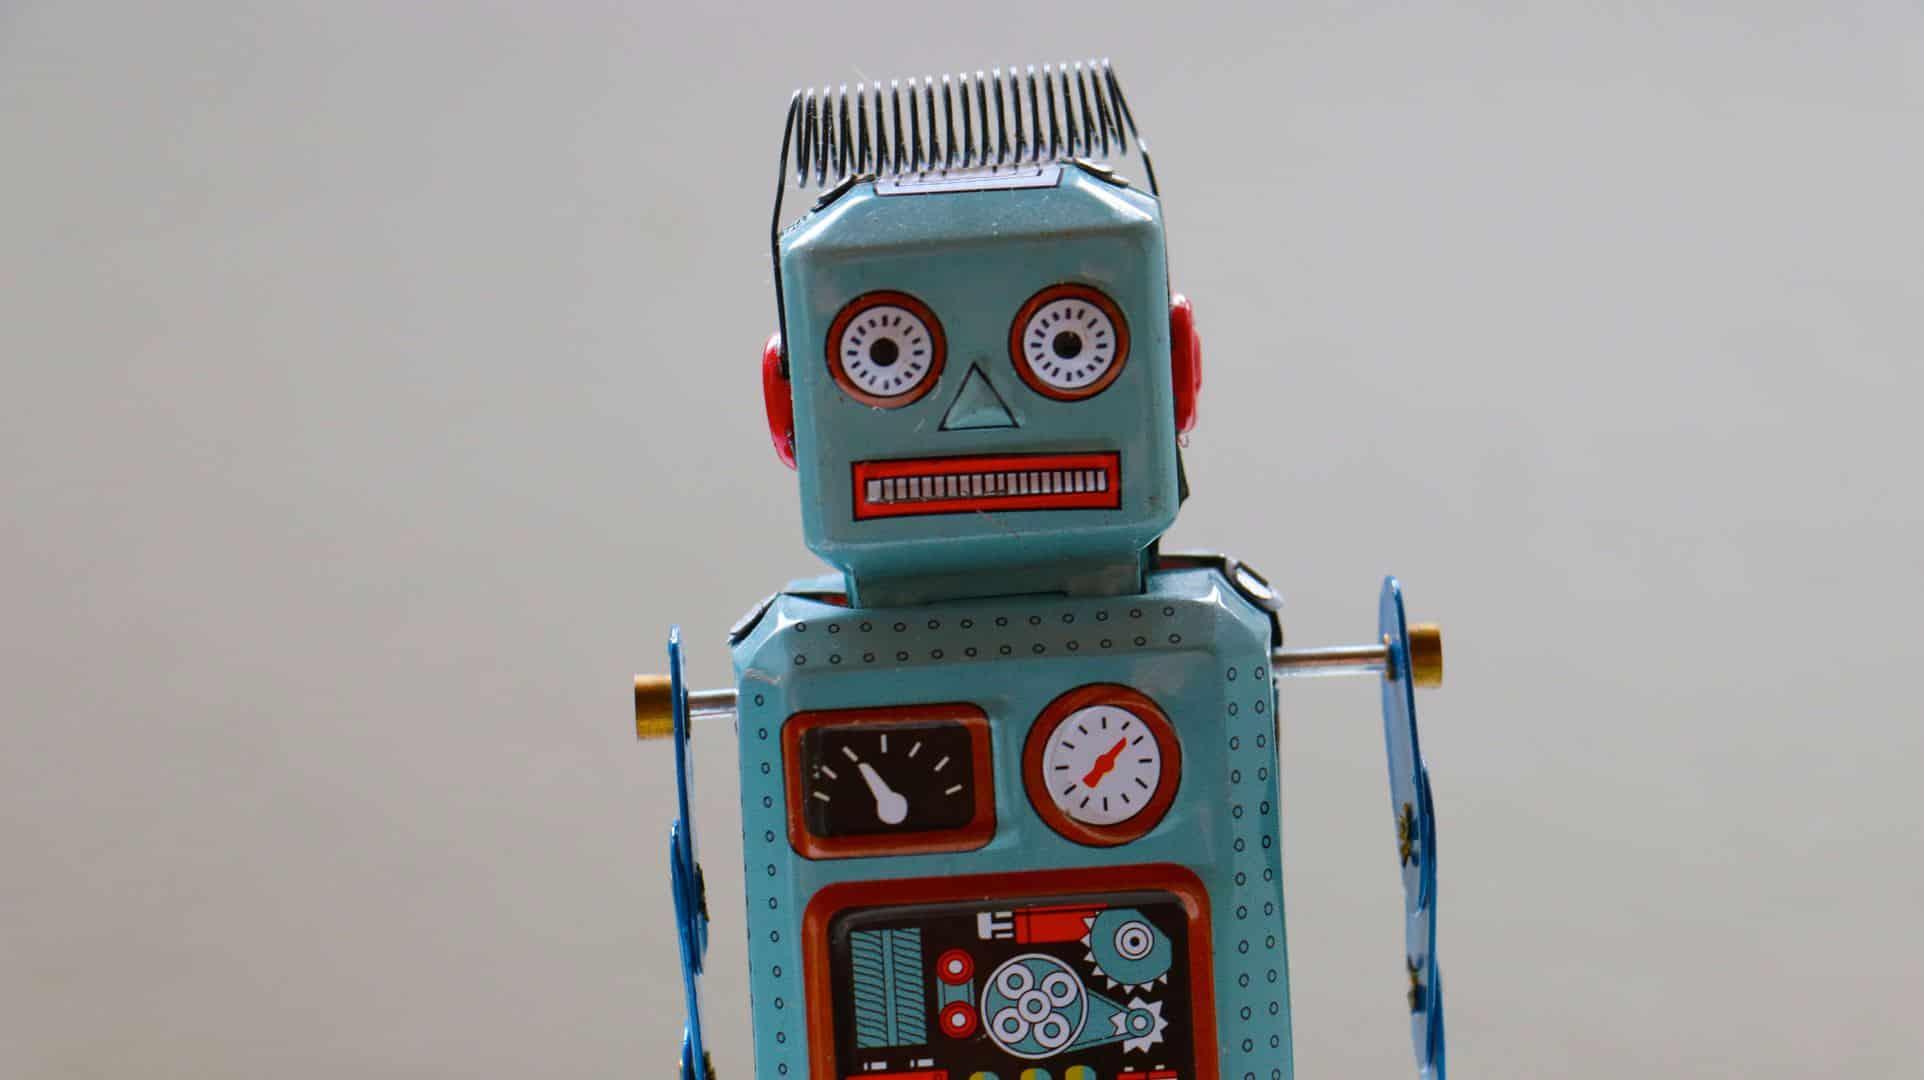 Artificial intelligence marketing